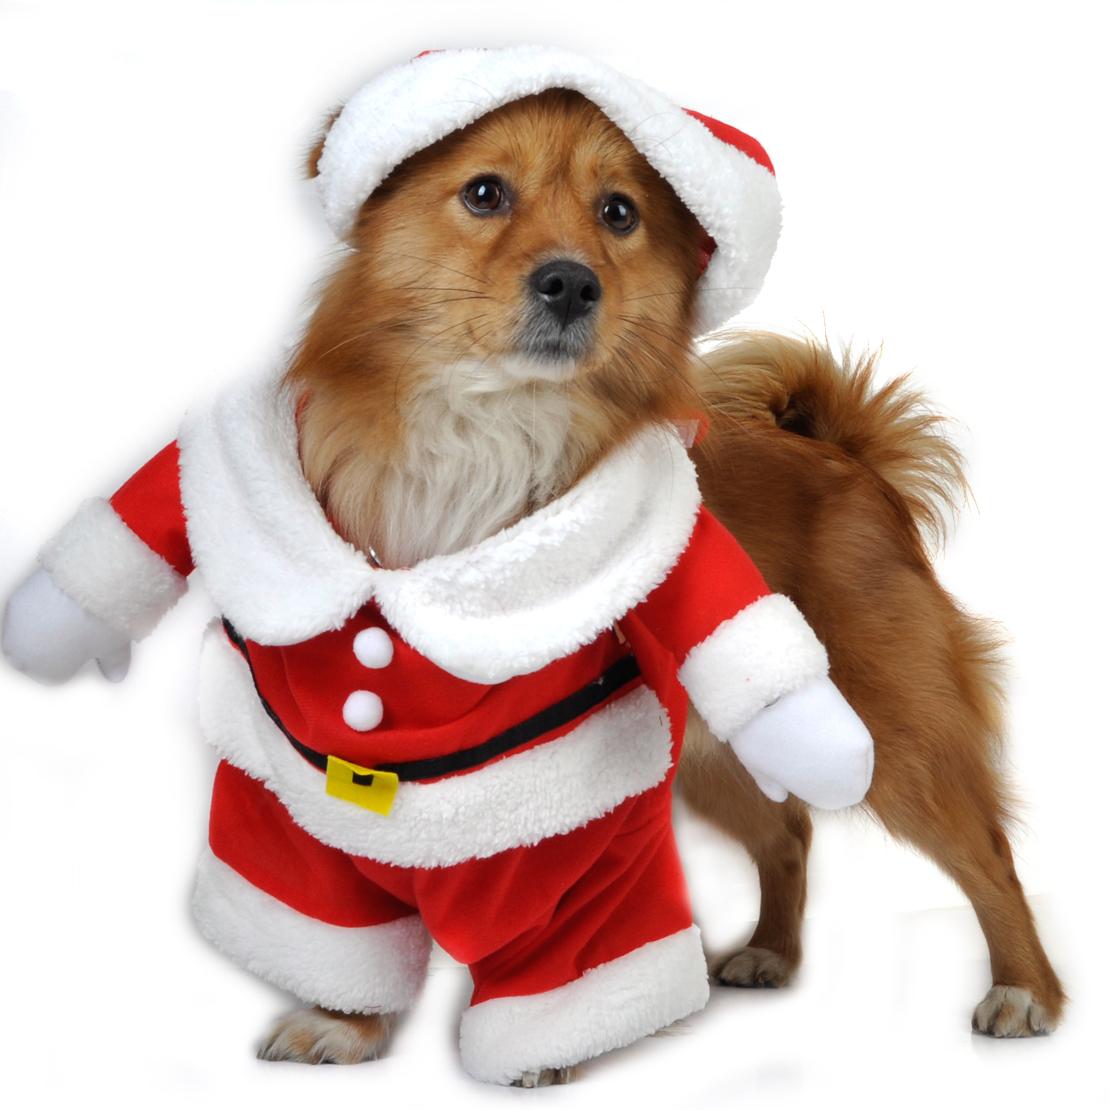 Pet Puppy Dog Christmas Clothes Santa Claus Costume